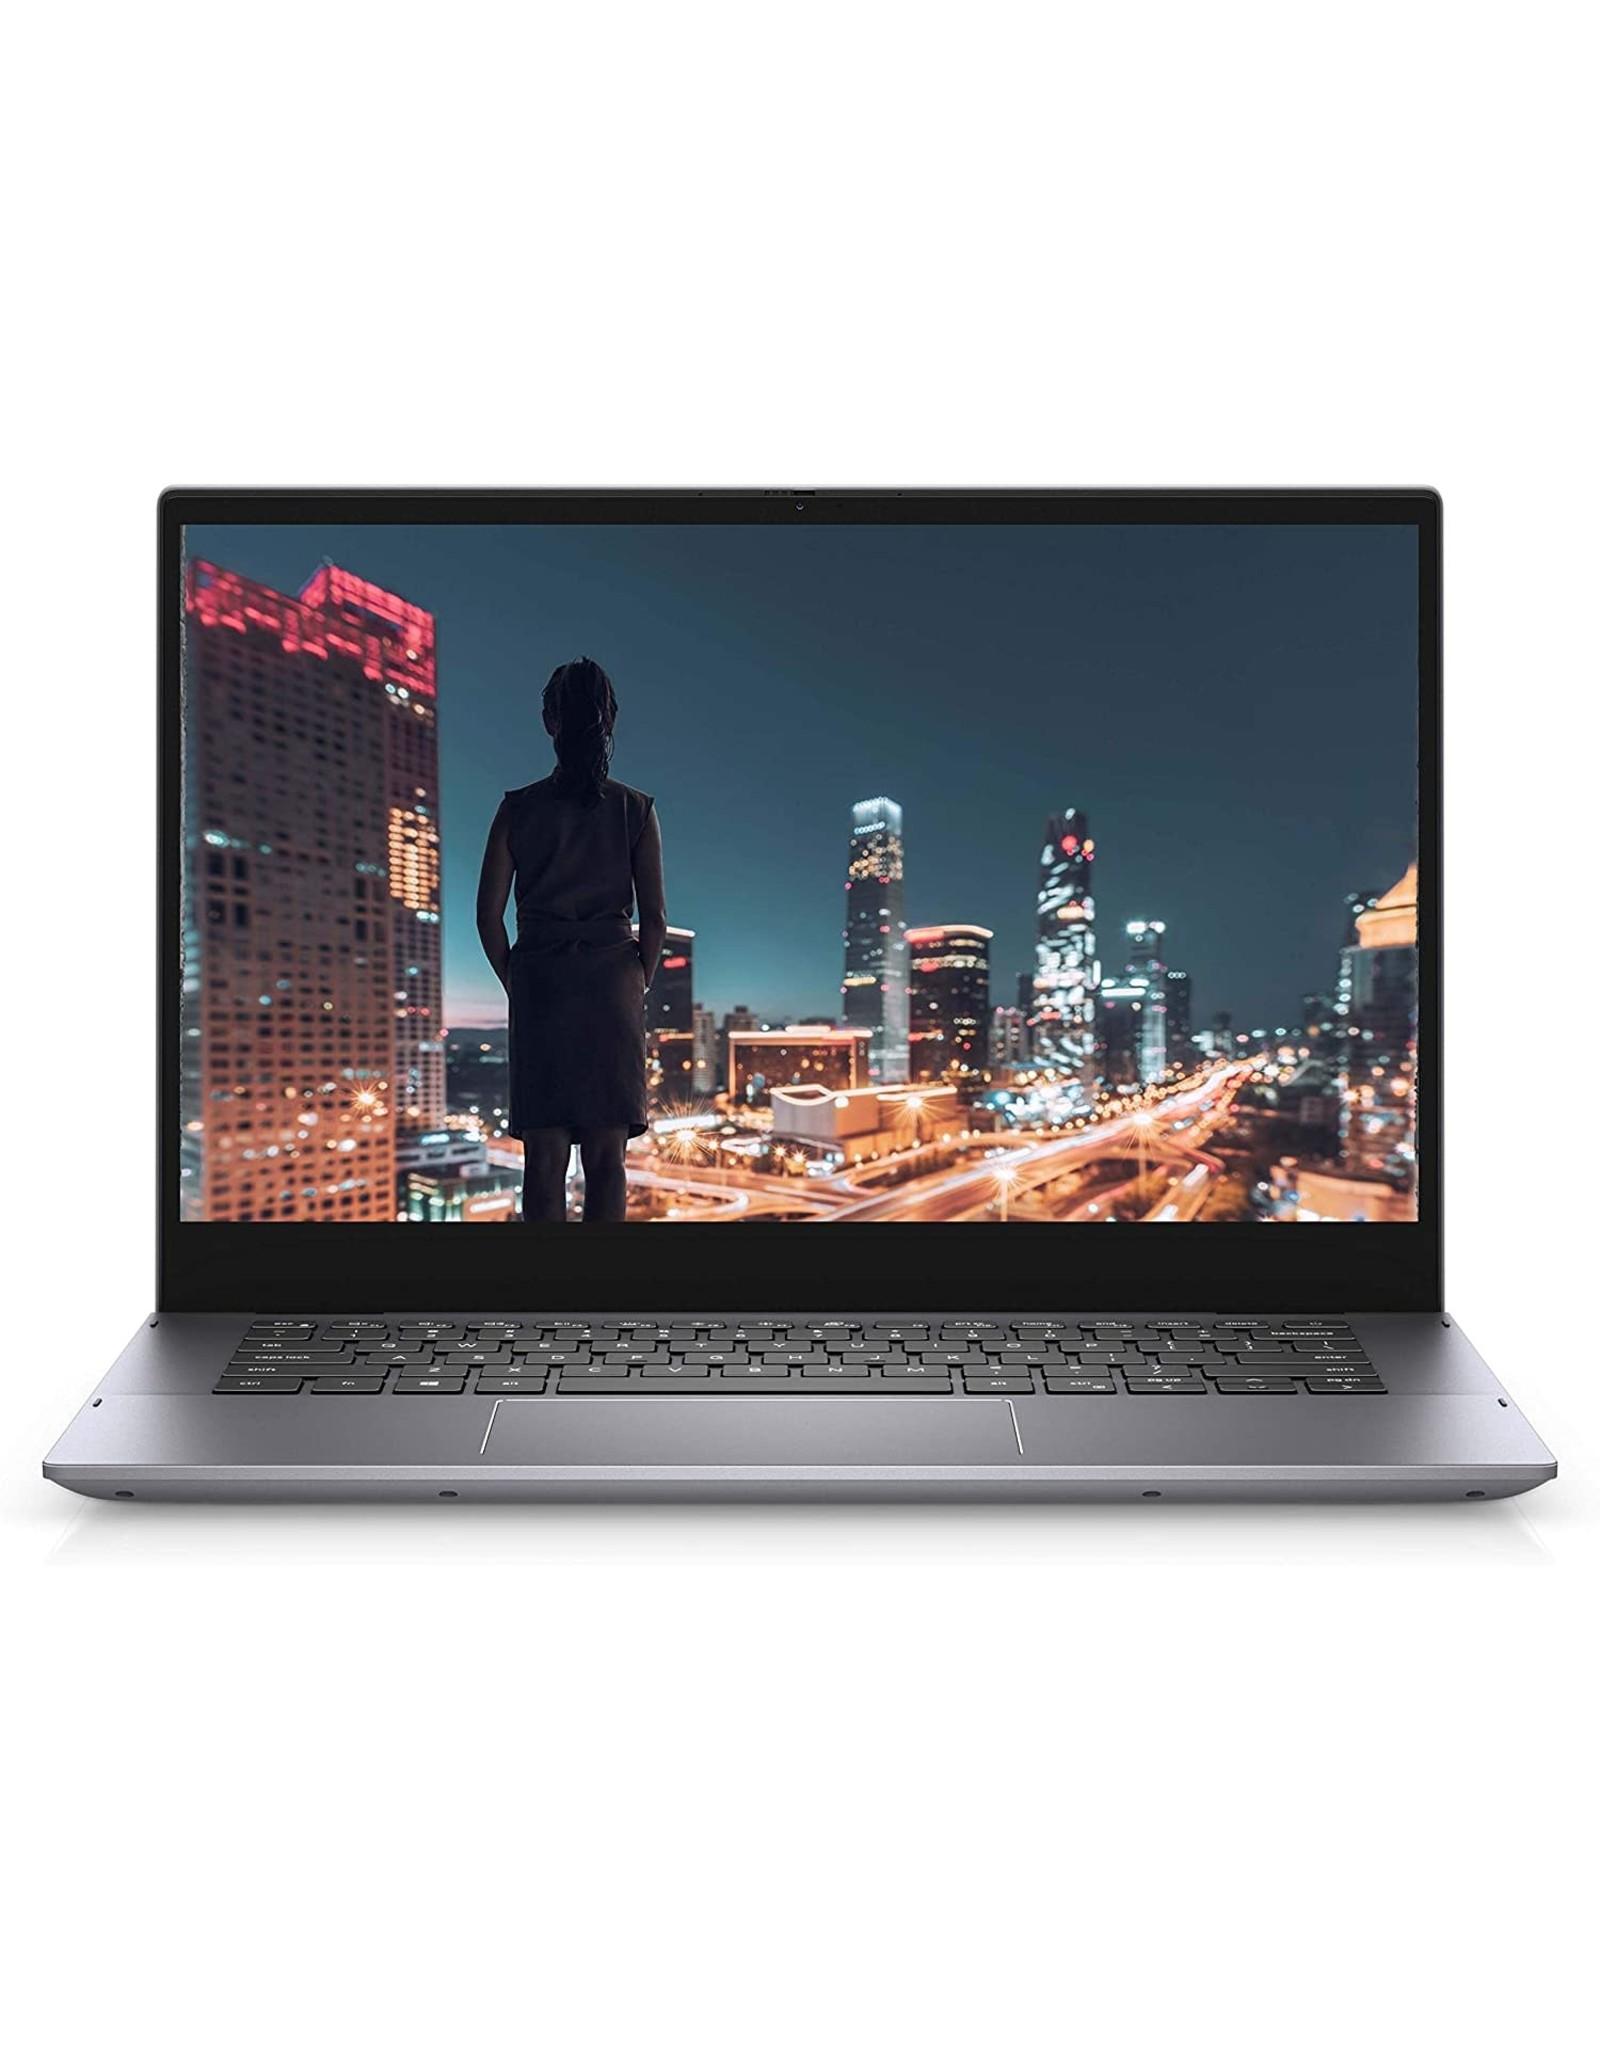 "DELL DELL INSPIRON 14 (5406) 2-N-1: 14"" FHD (1920 x 1080) TOUCH, 11TH GEN i5-1135G7, 8GB DDR4, 512GB, WINDOWS 10 HOME, 720HD WEBCAM, INTEL IRIS Xe GRAPHICS, 1 YR"